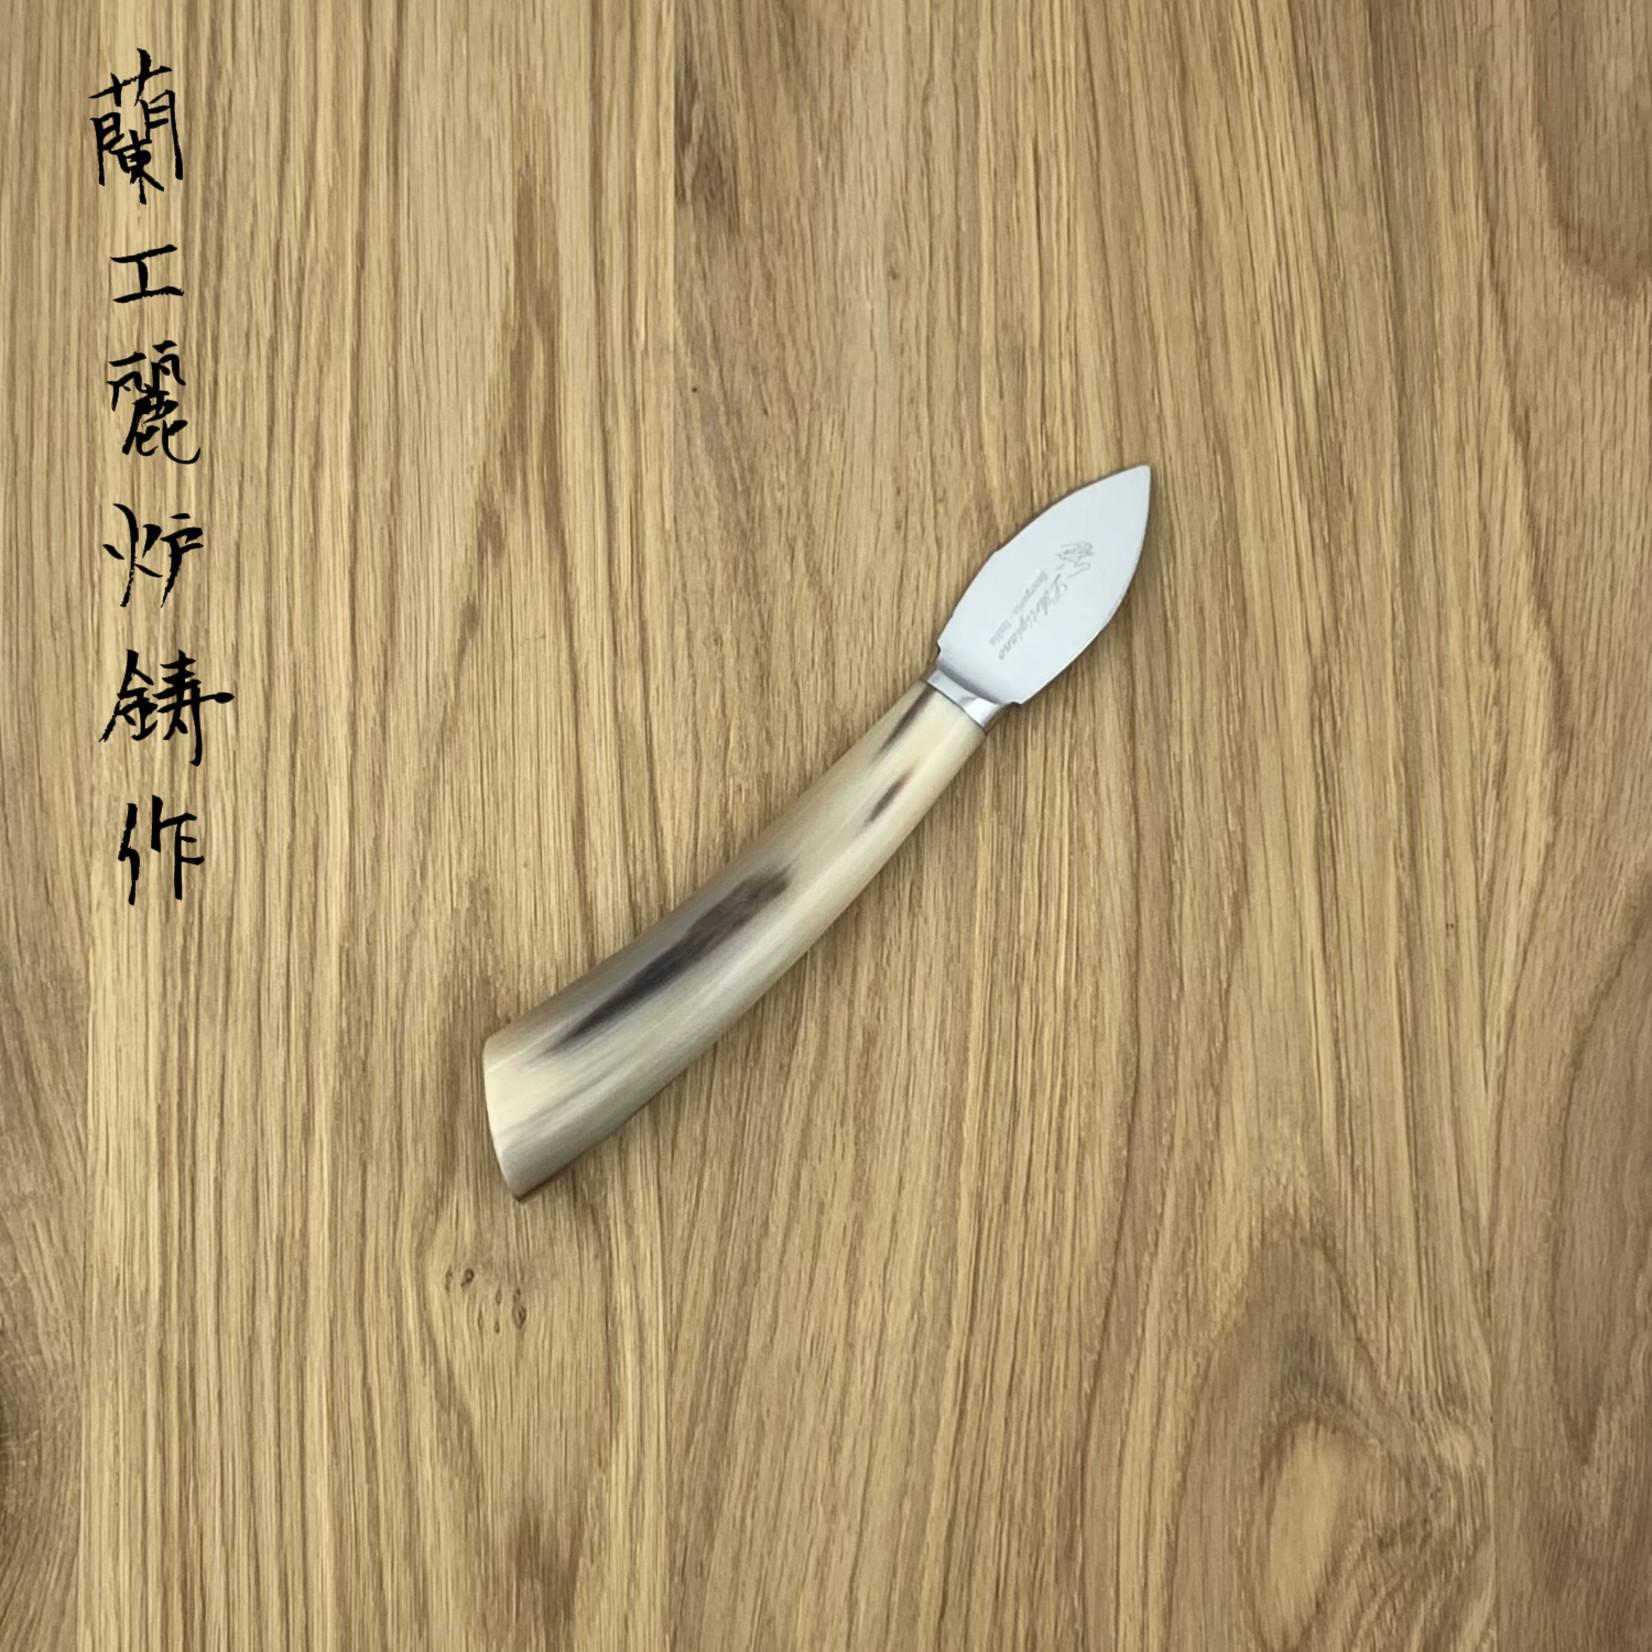 L'ARTIGIANO SCARPERIA Cheese knife Parmesan horn